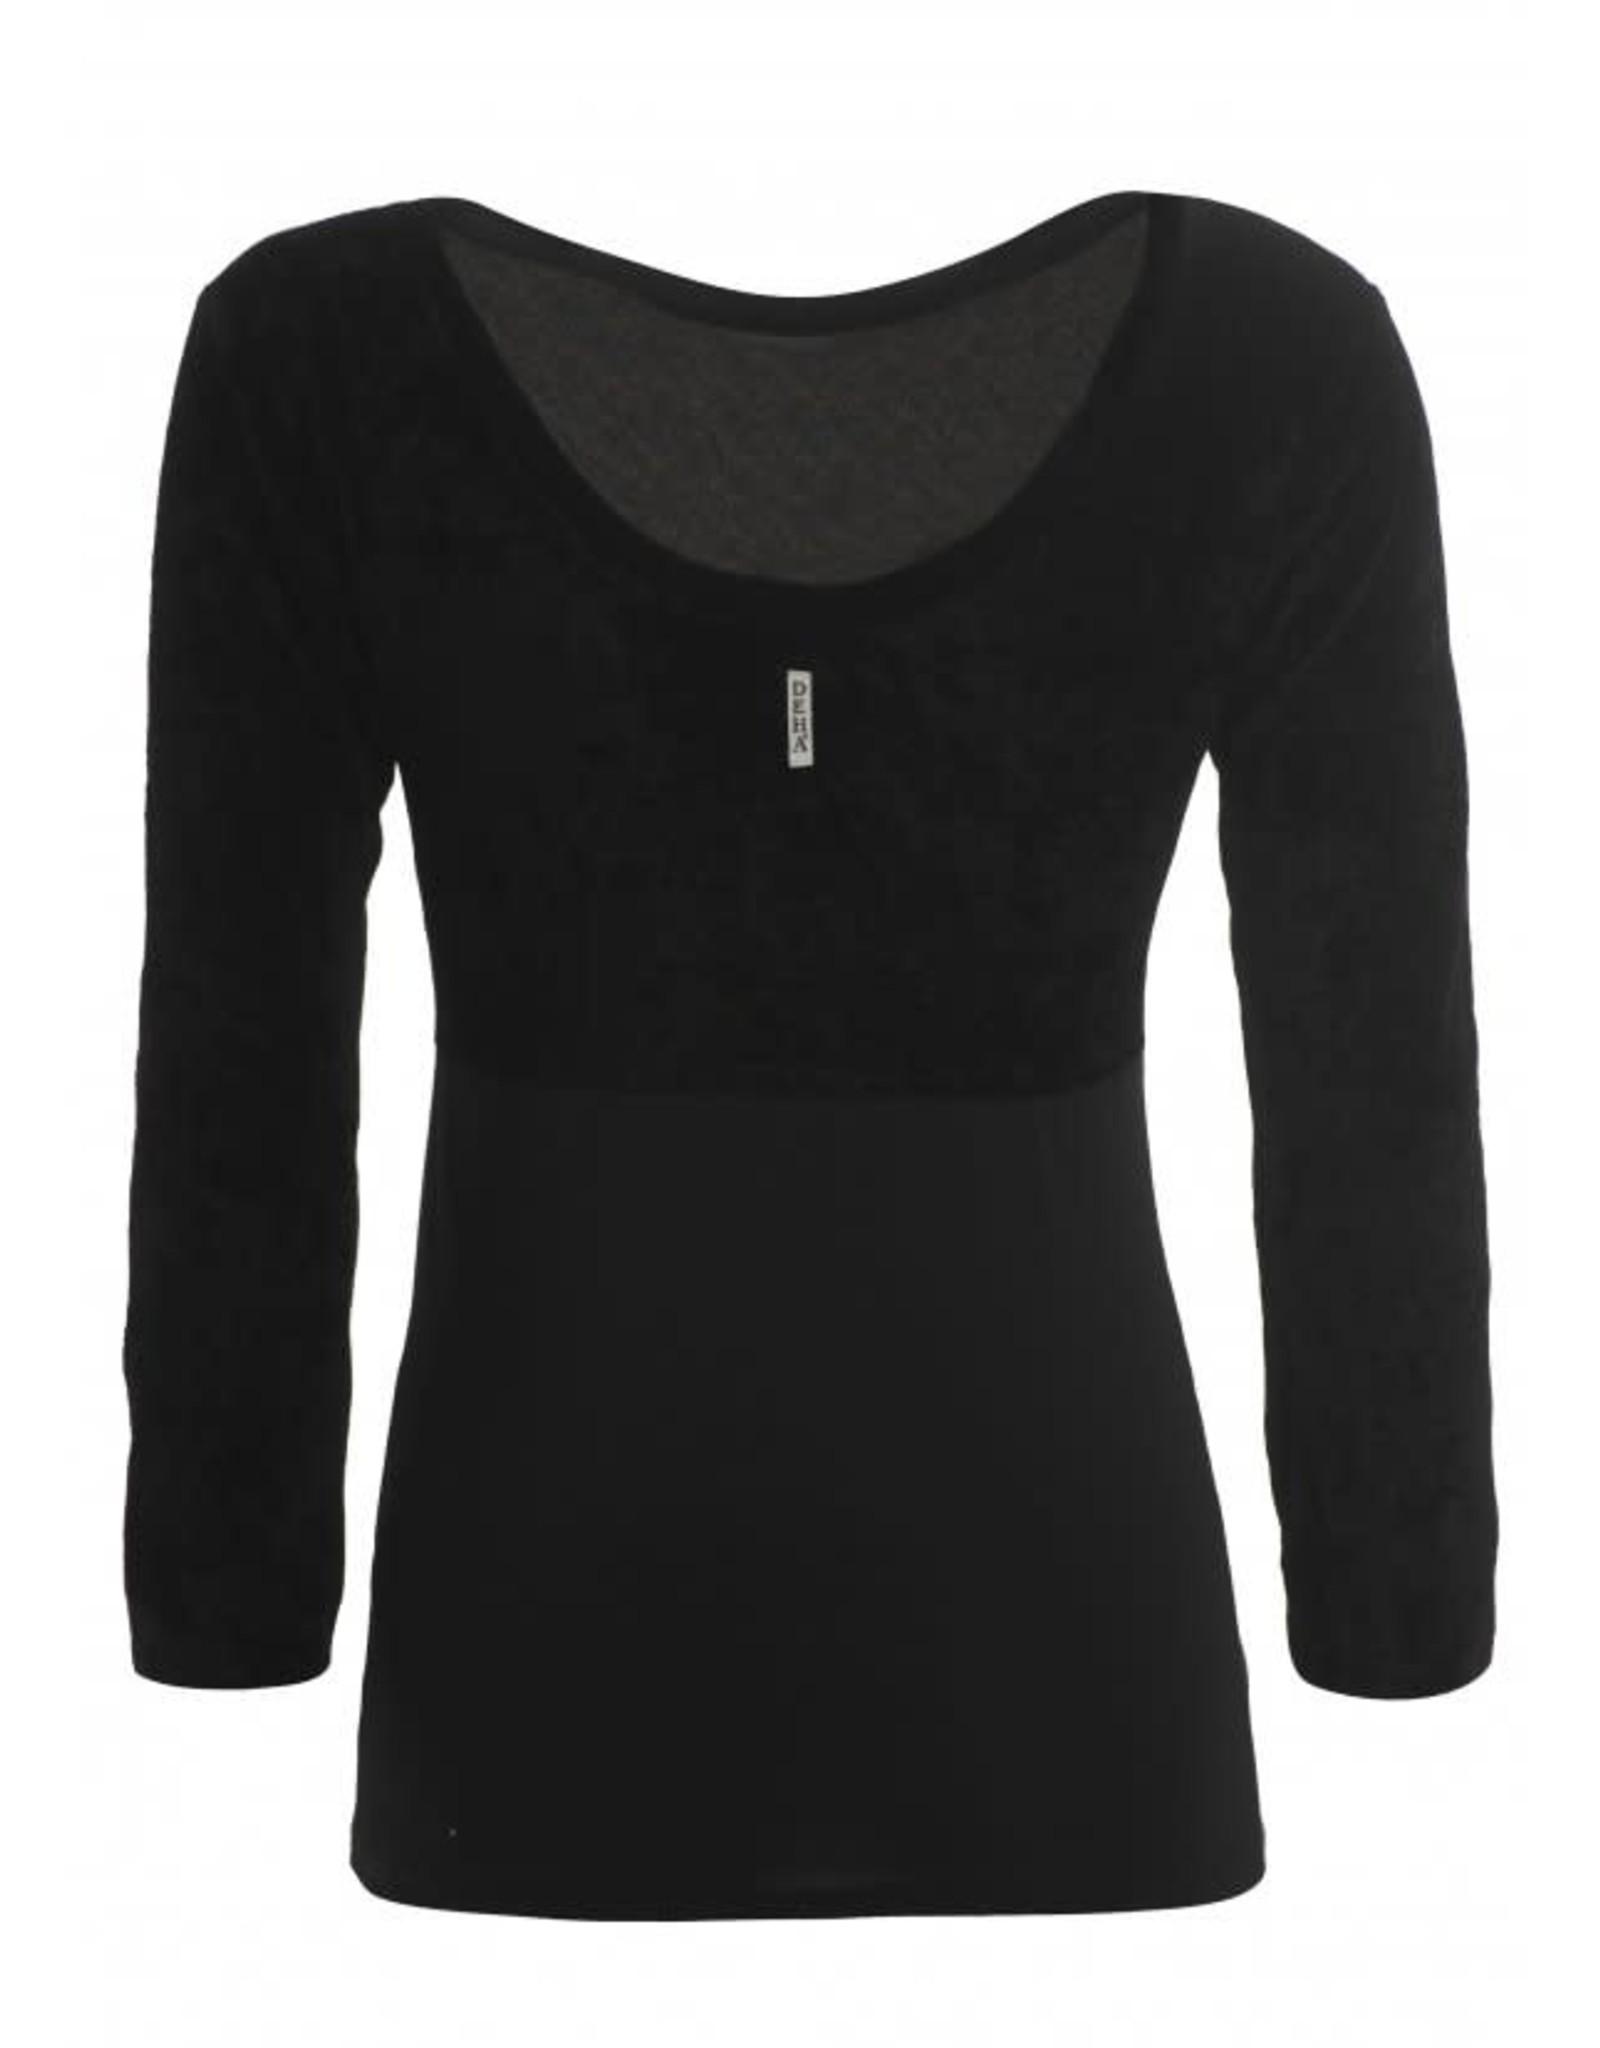 Deha B34022 ¾ sleeve shirt